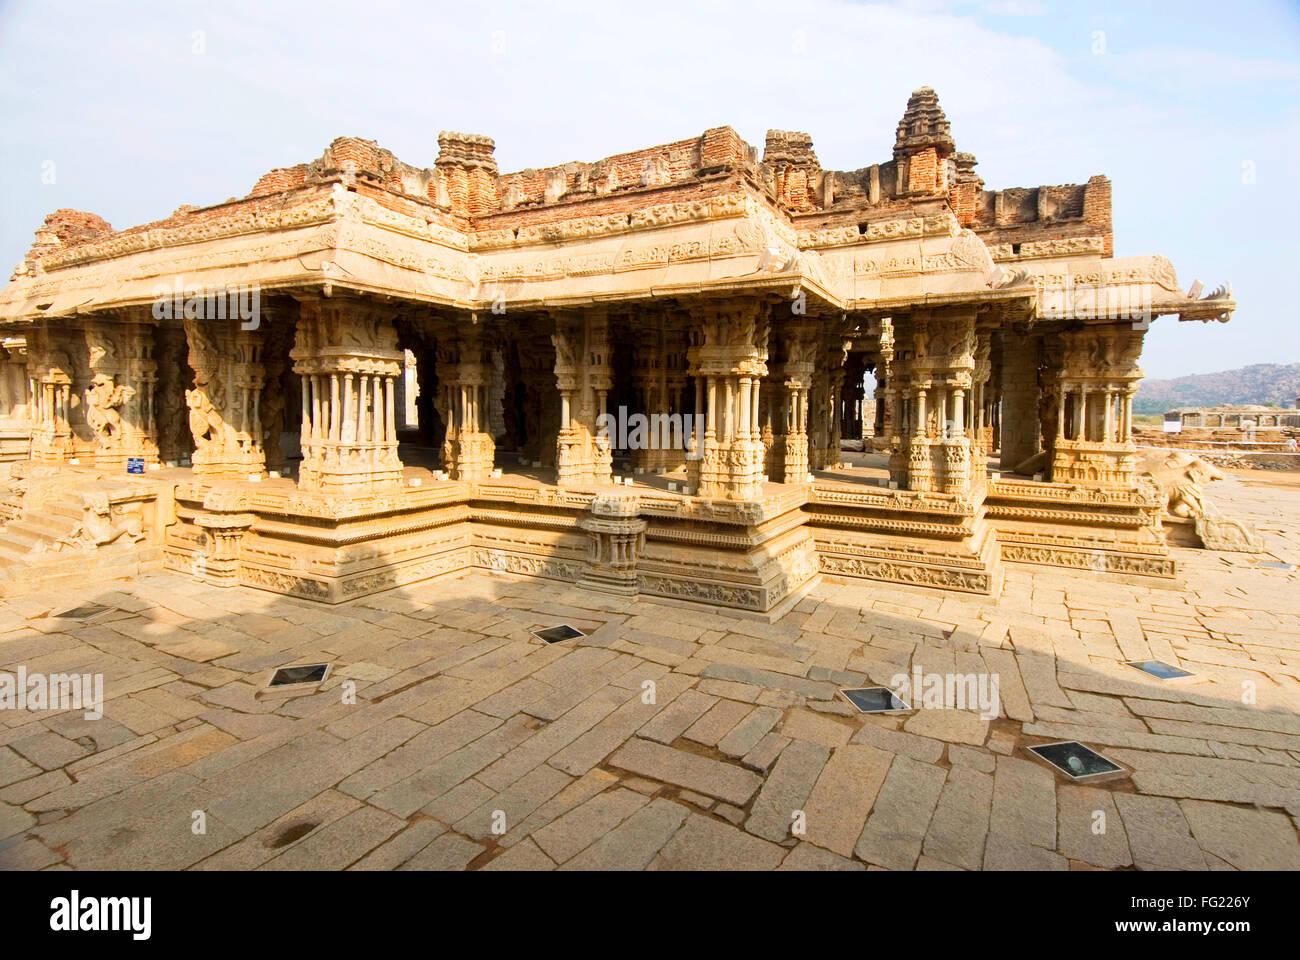 Sixteenth century Vithala temple monument of Hampi fames for musical pillars , Karnataka , India World Heritage - Stock Image